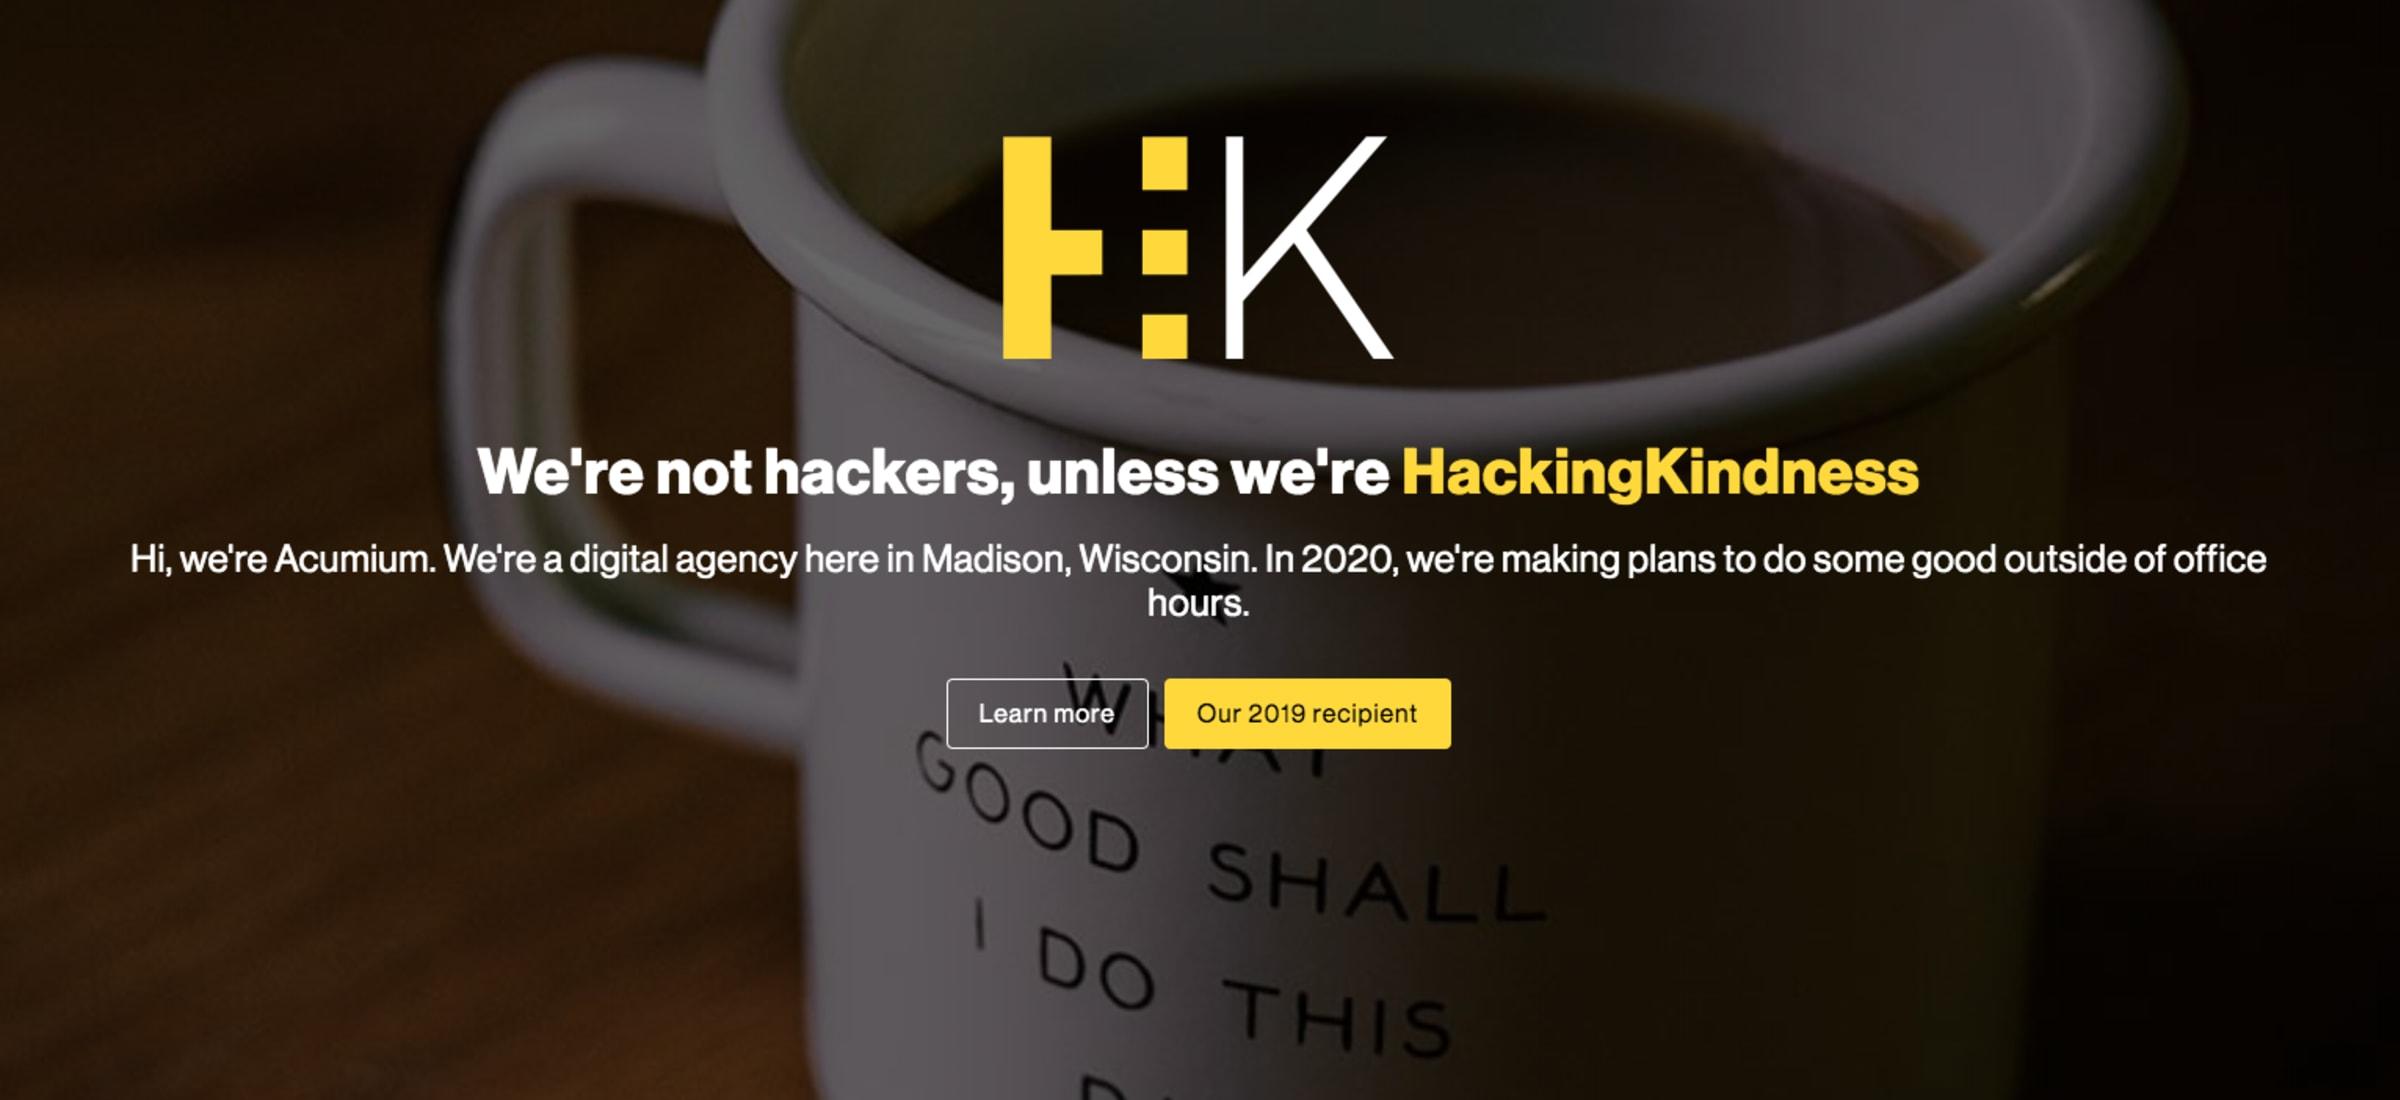 HackingKindness 2020